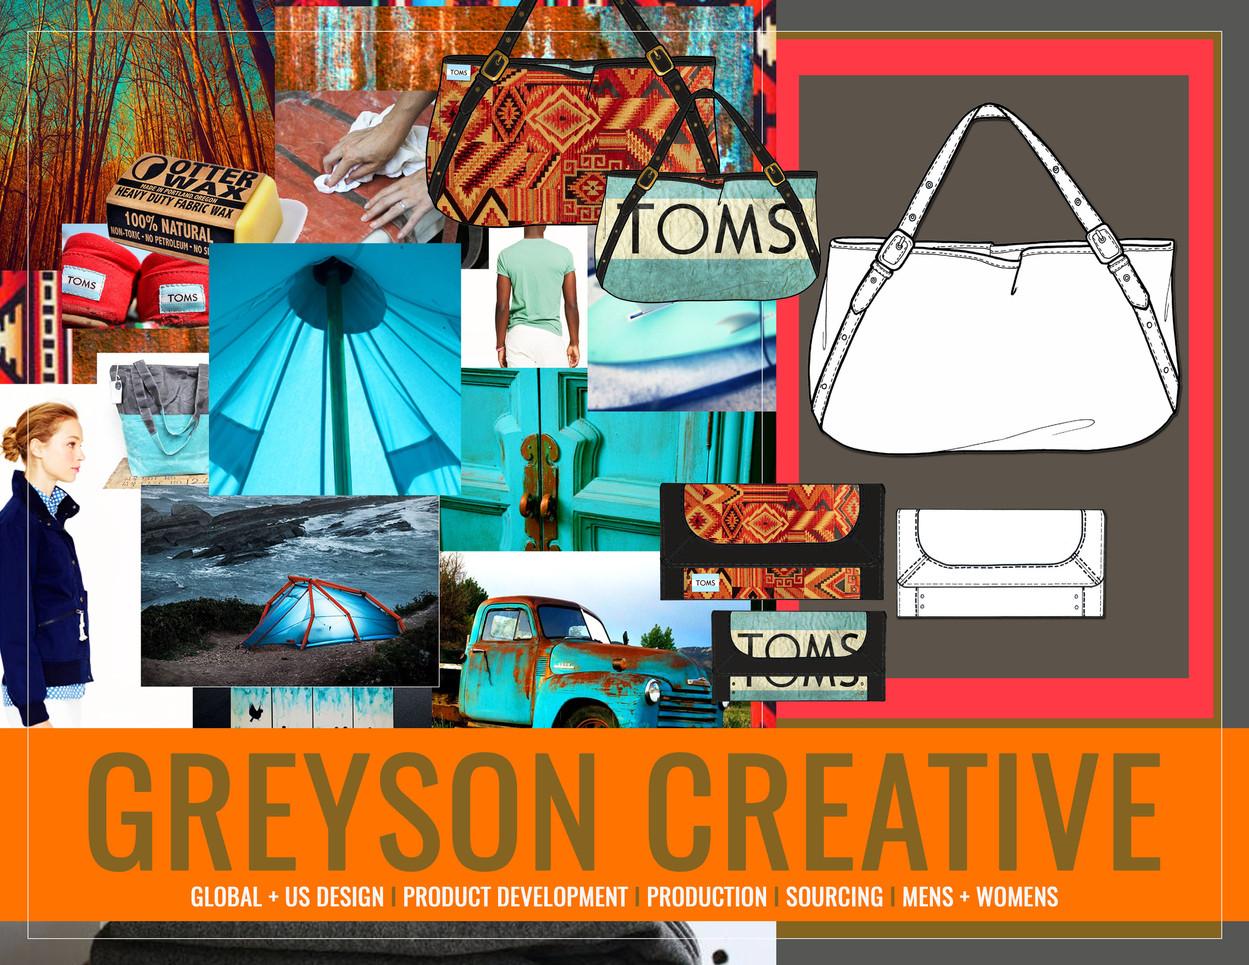 TOMS: Greyson Creative by Lukas Greyson